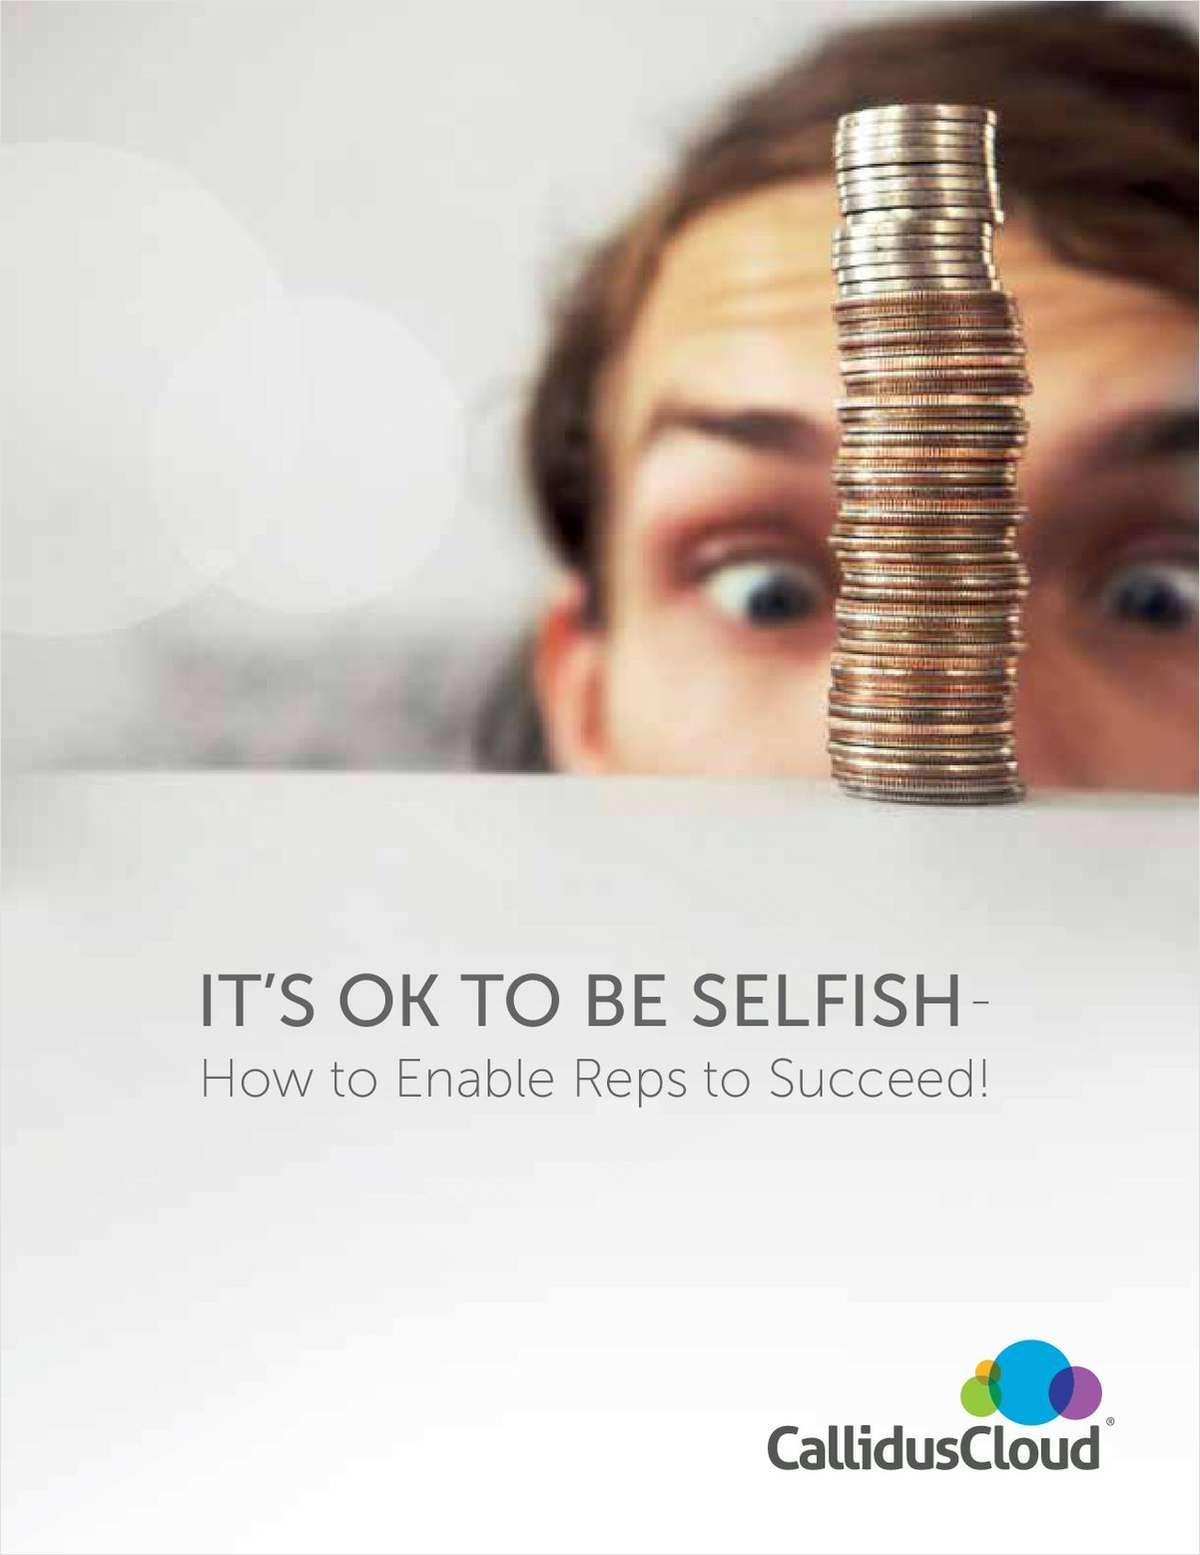 It's OK To Be Selfish